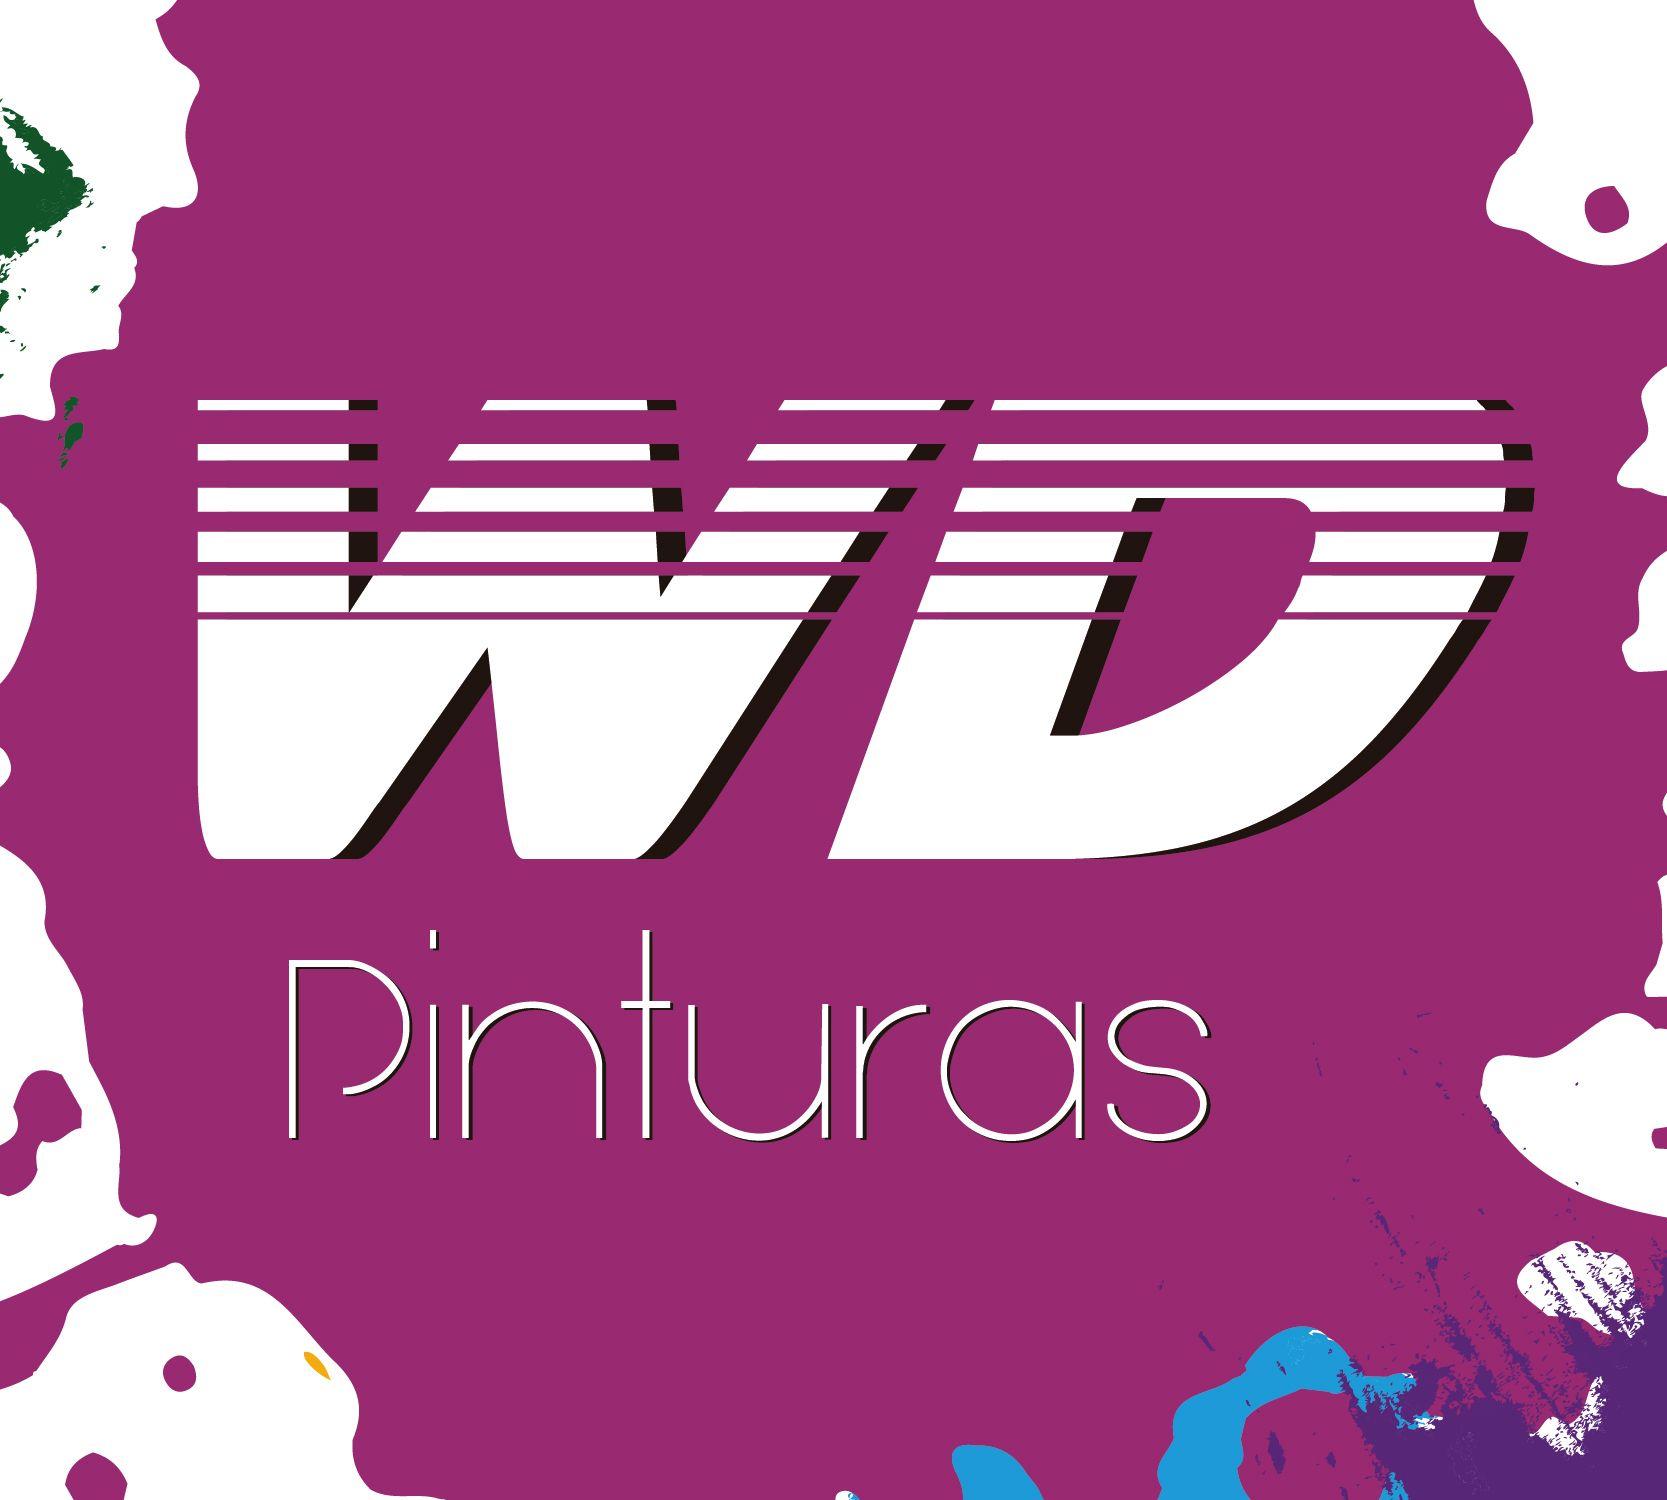 WD Pinturas - Welton em Bertioga